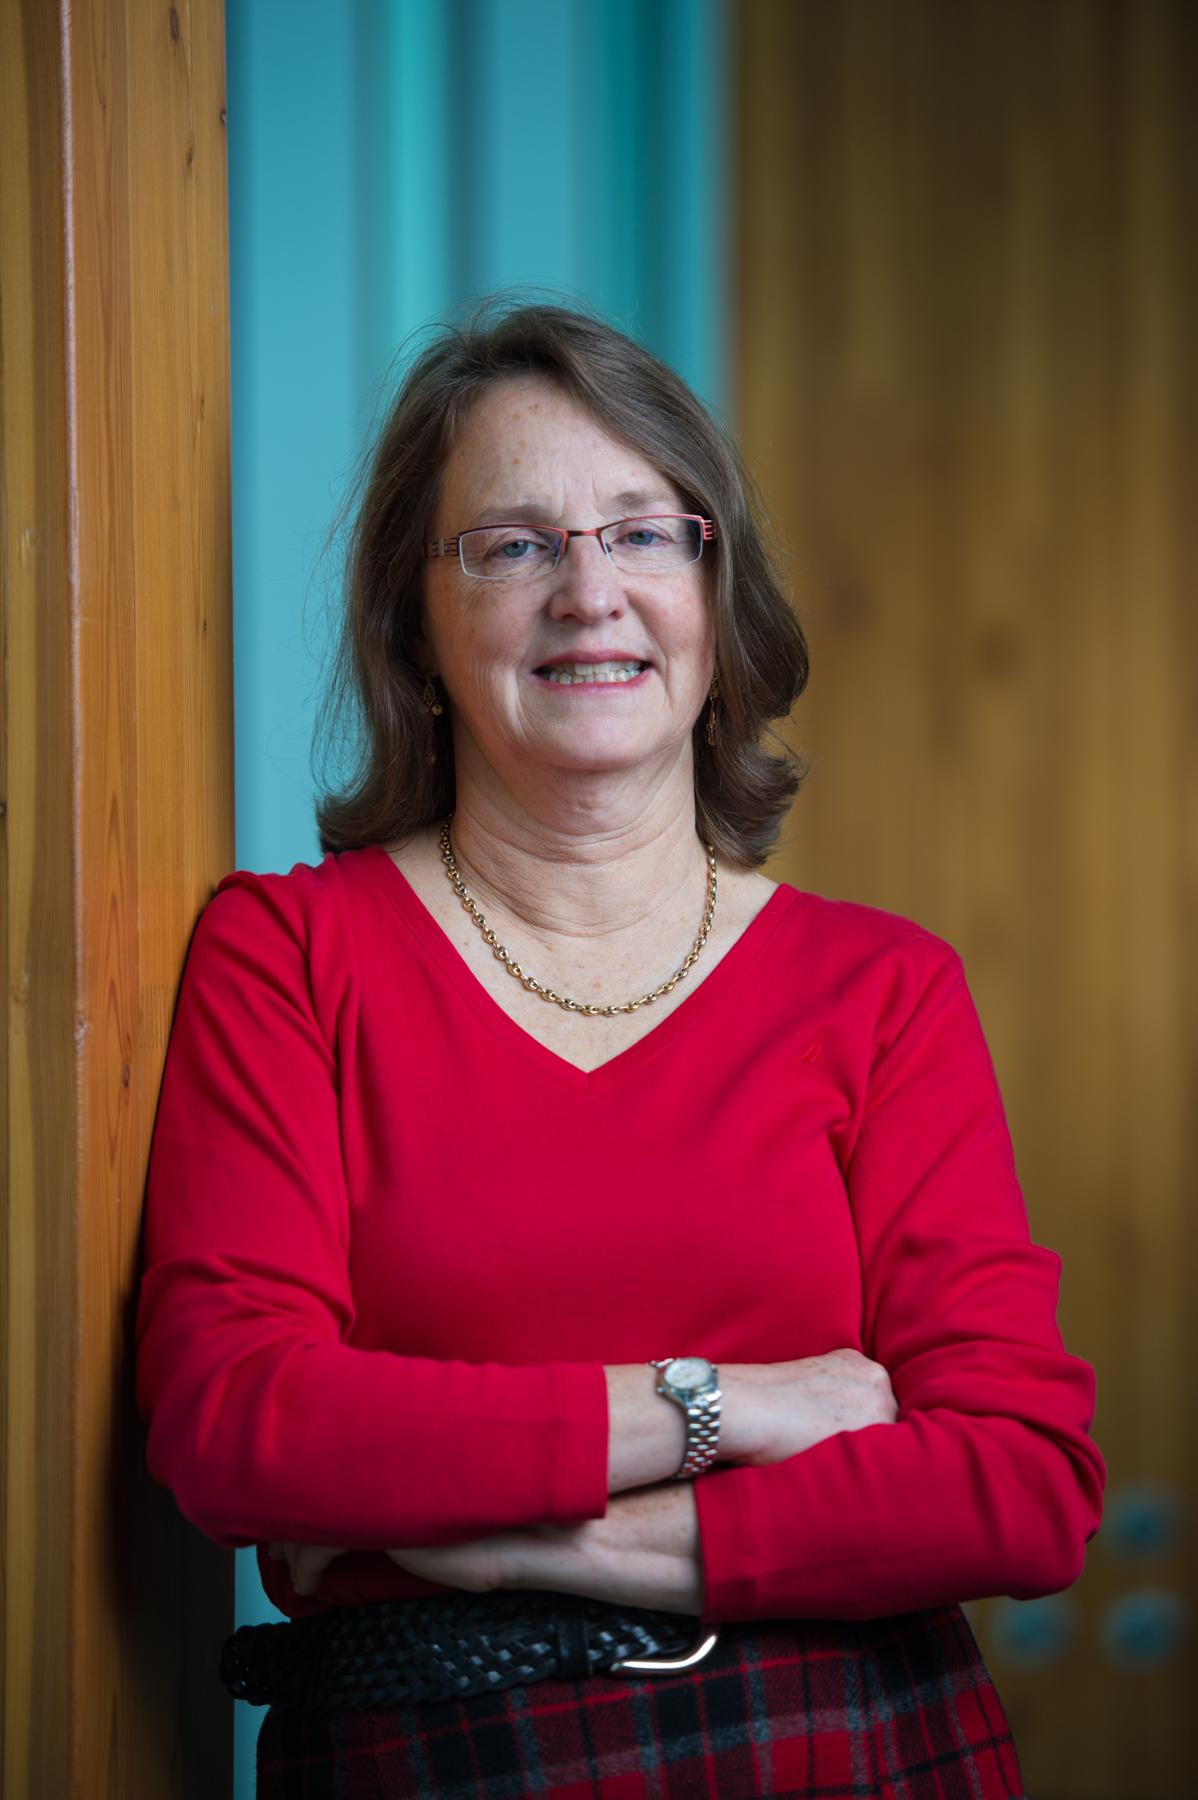 Dr. Mary McKenna